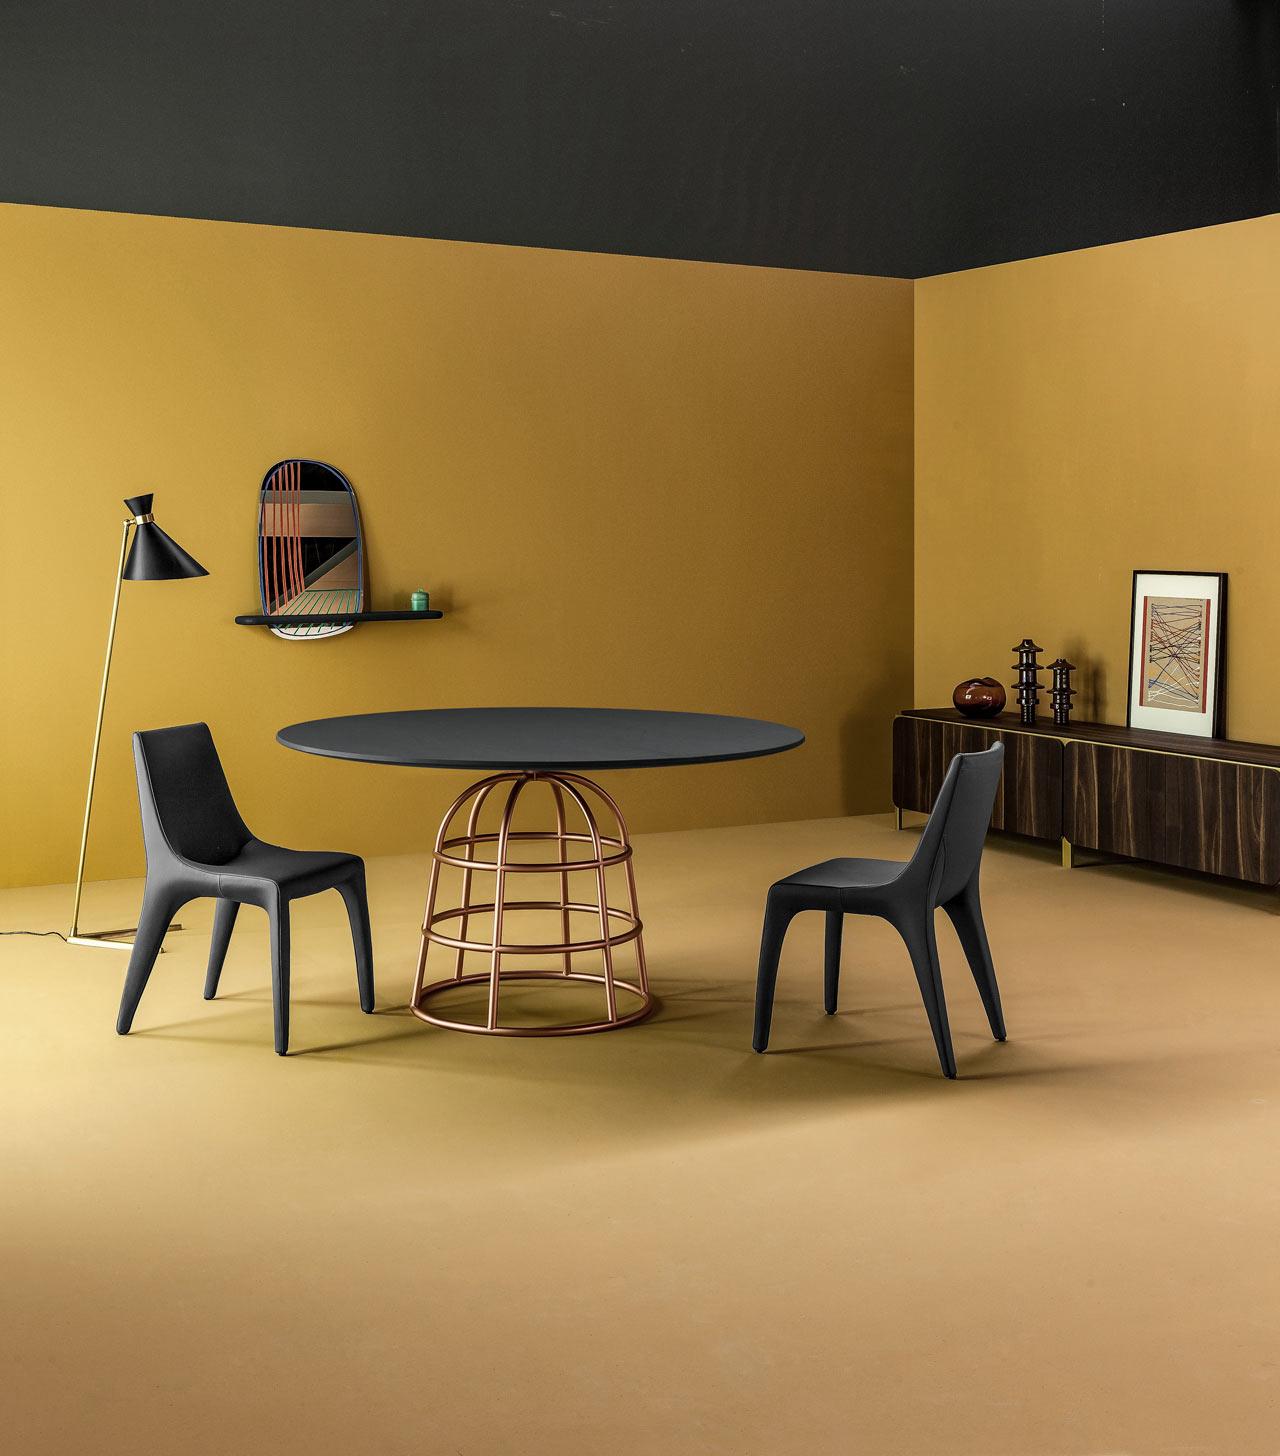 MASS-TABLE-Alain-Gilles-Bonaldo-1